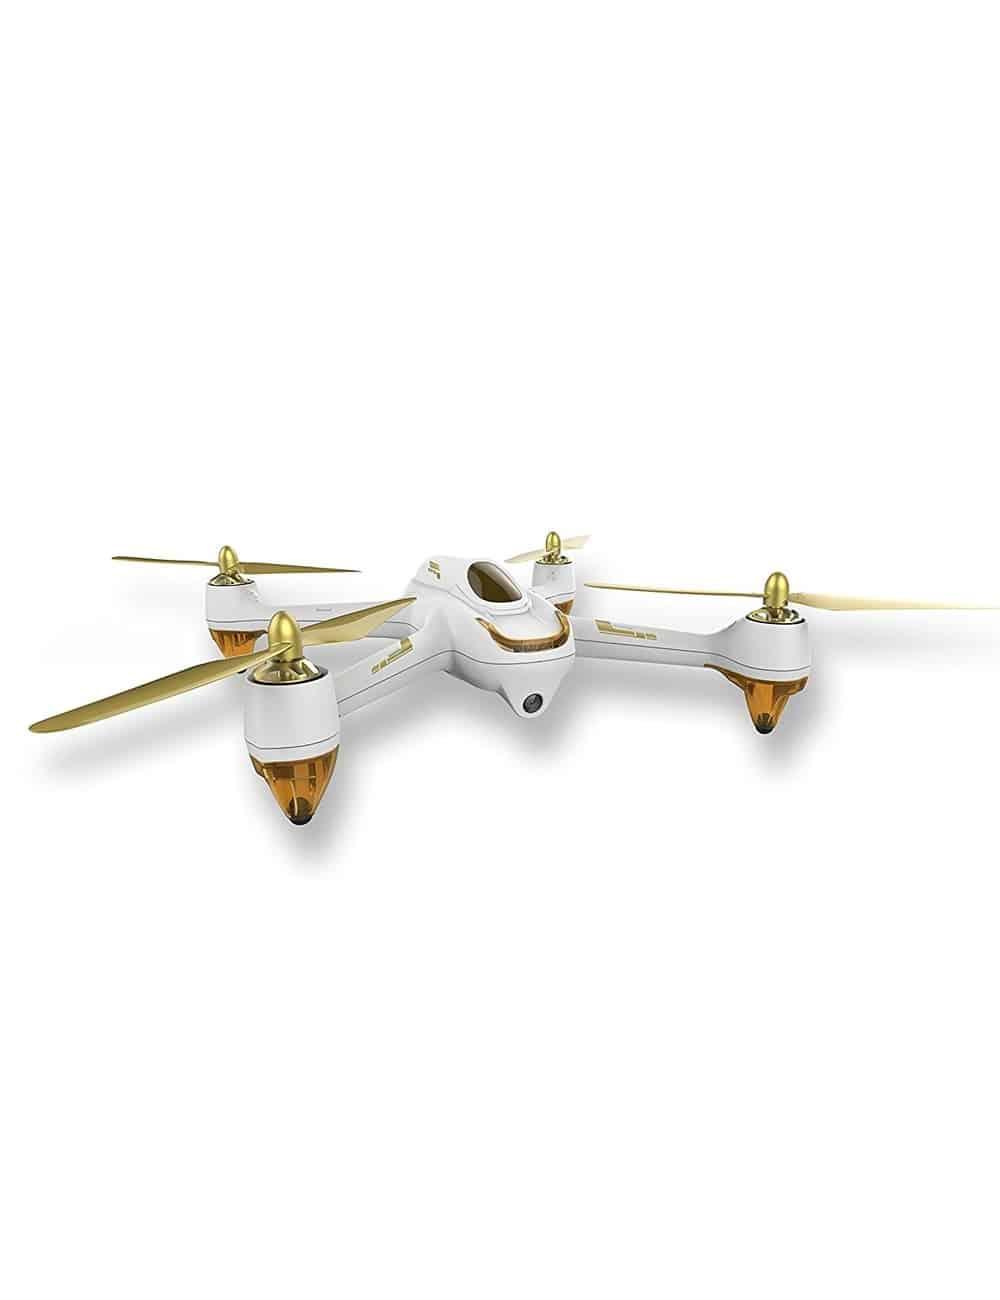 Hubstan H501S X4 FPV Quadcopter